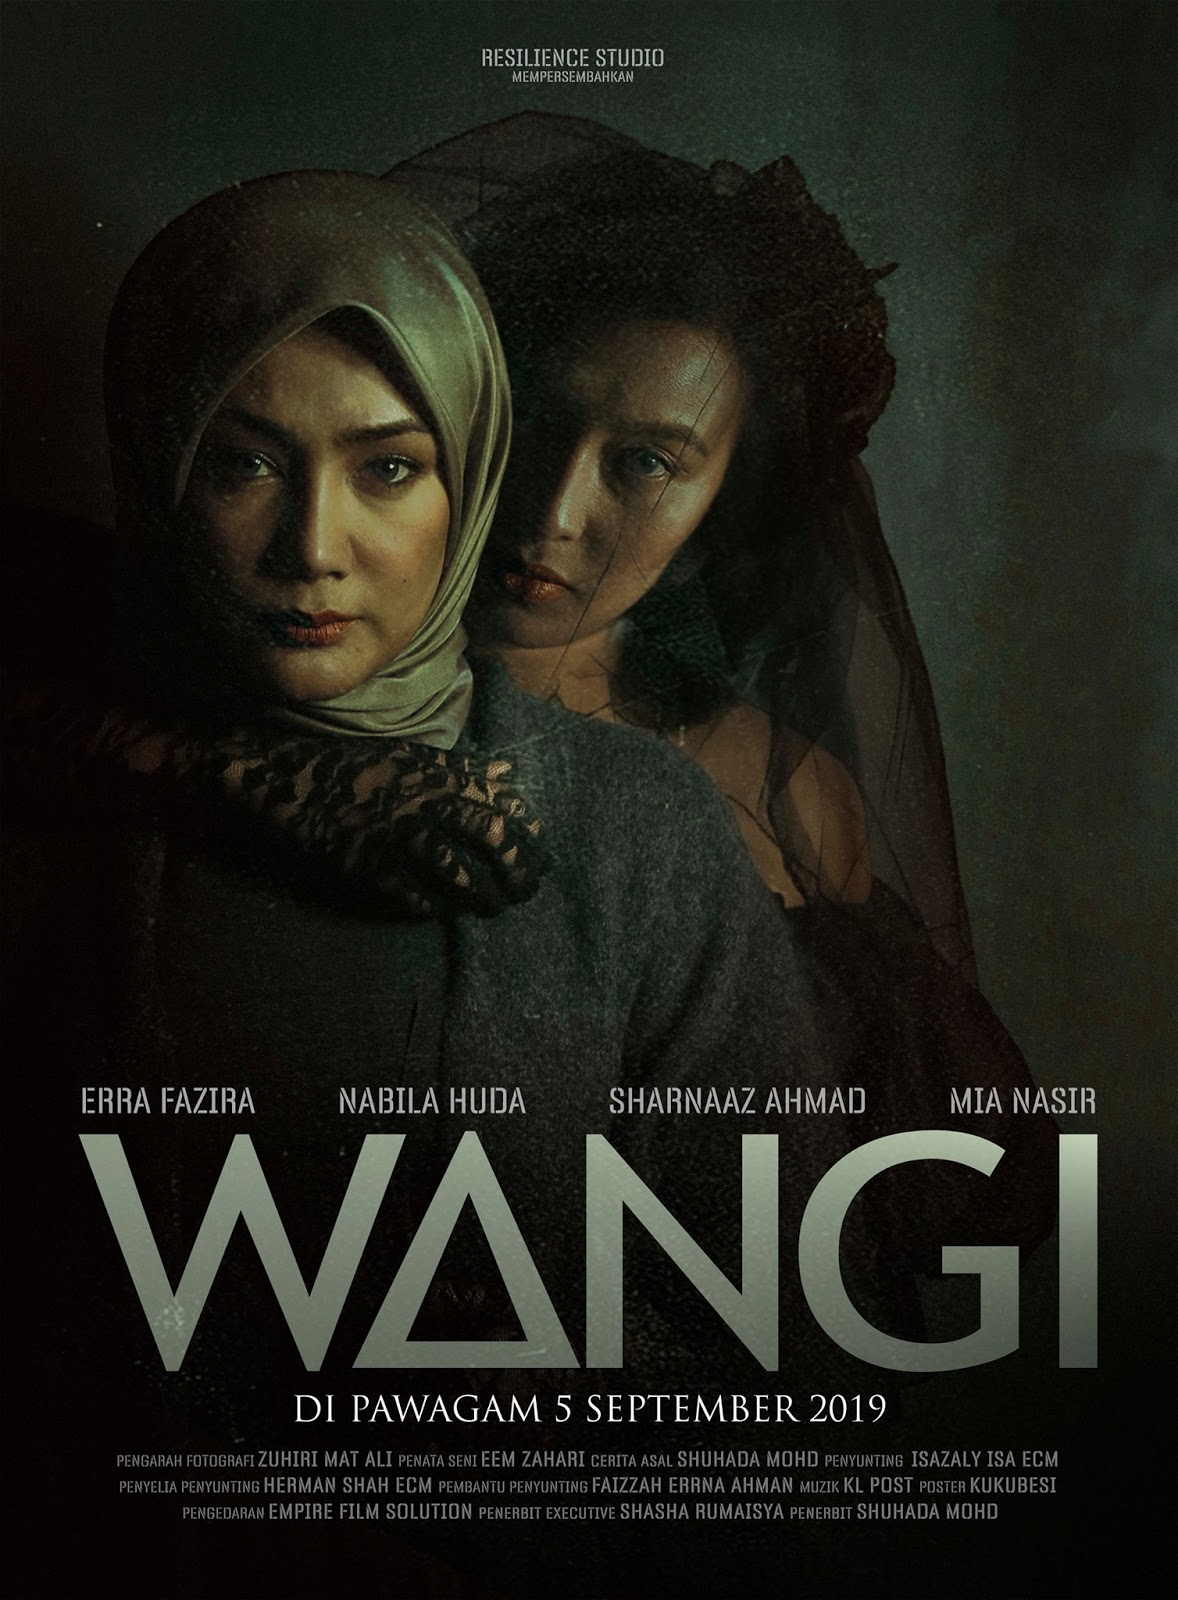 Filem Wangi